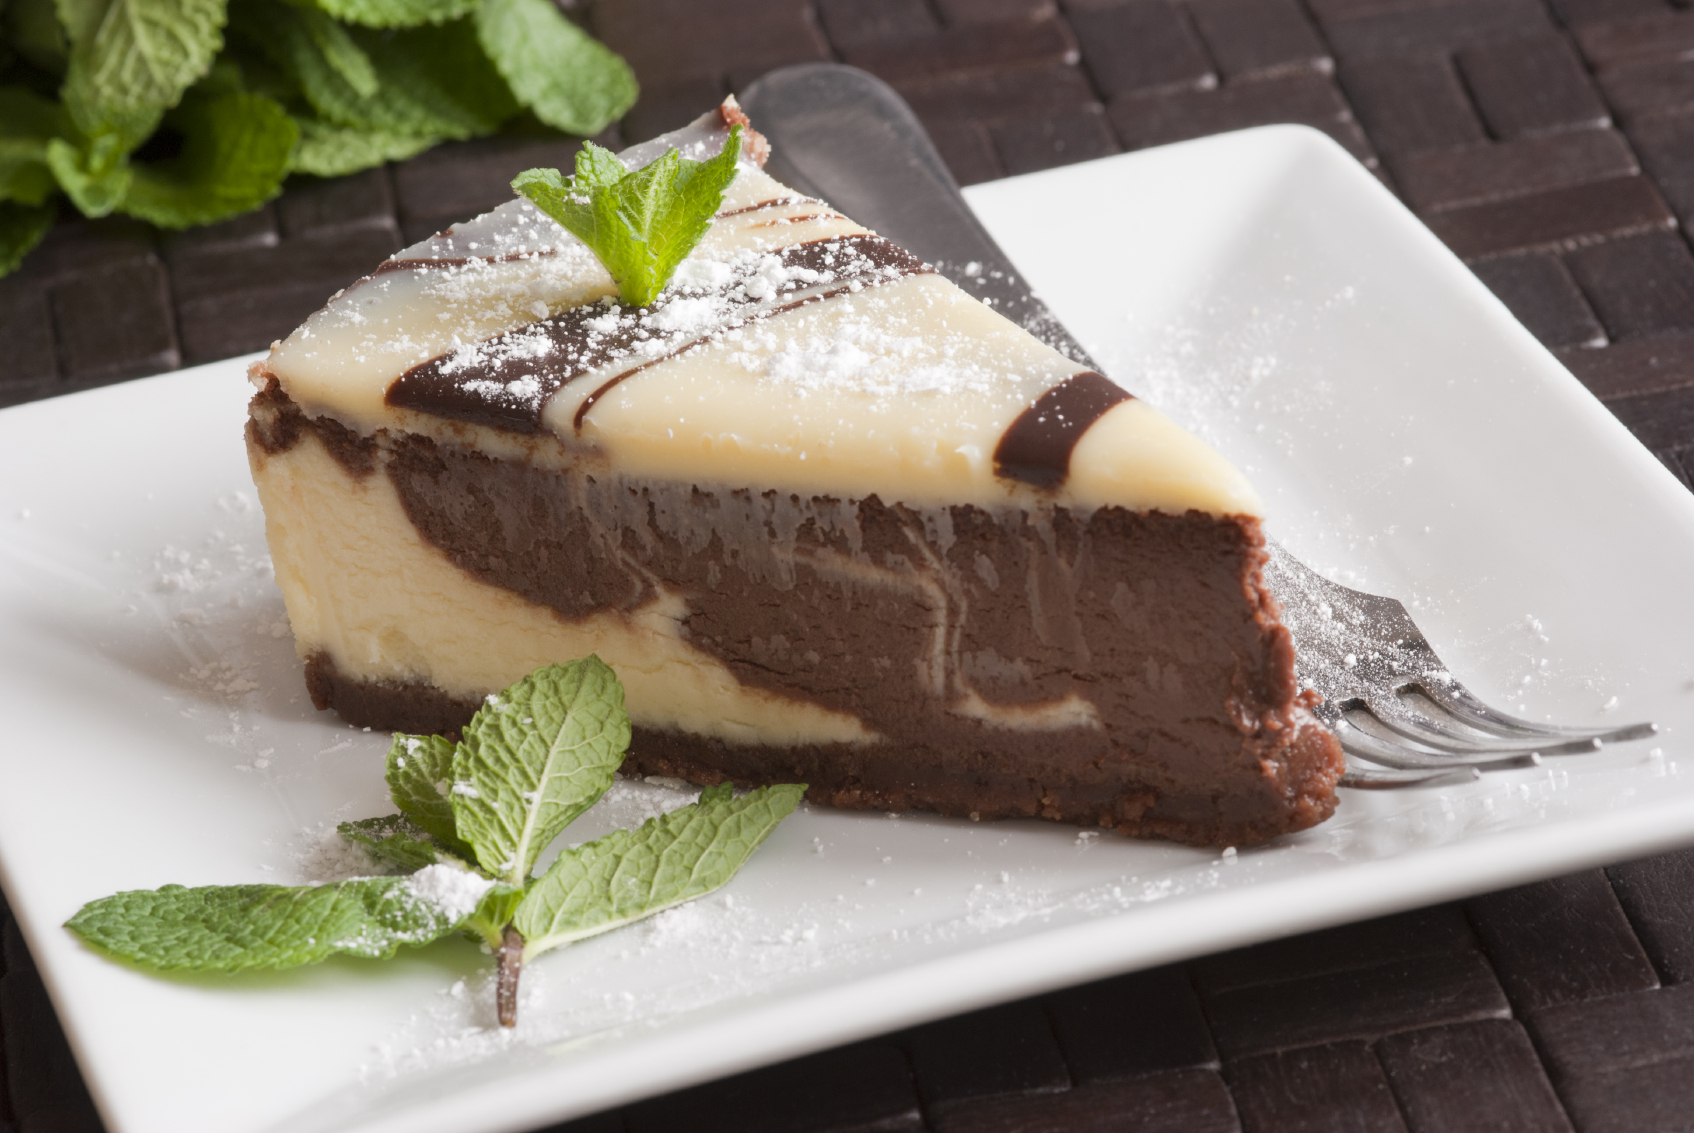 Recipe: Mint-chocolate cheesecake